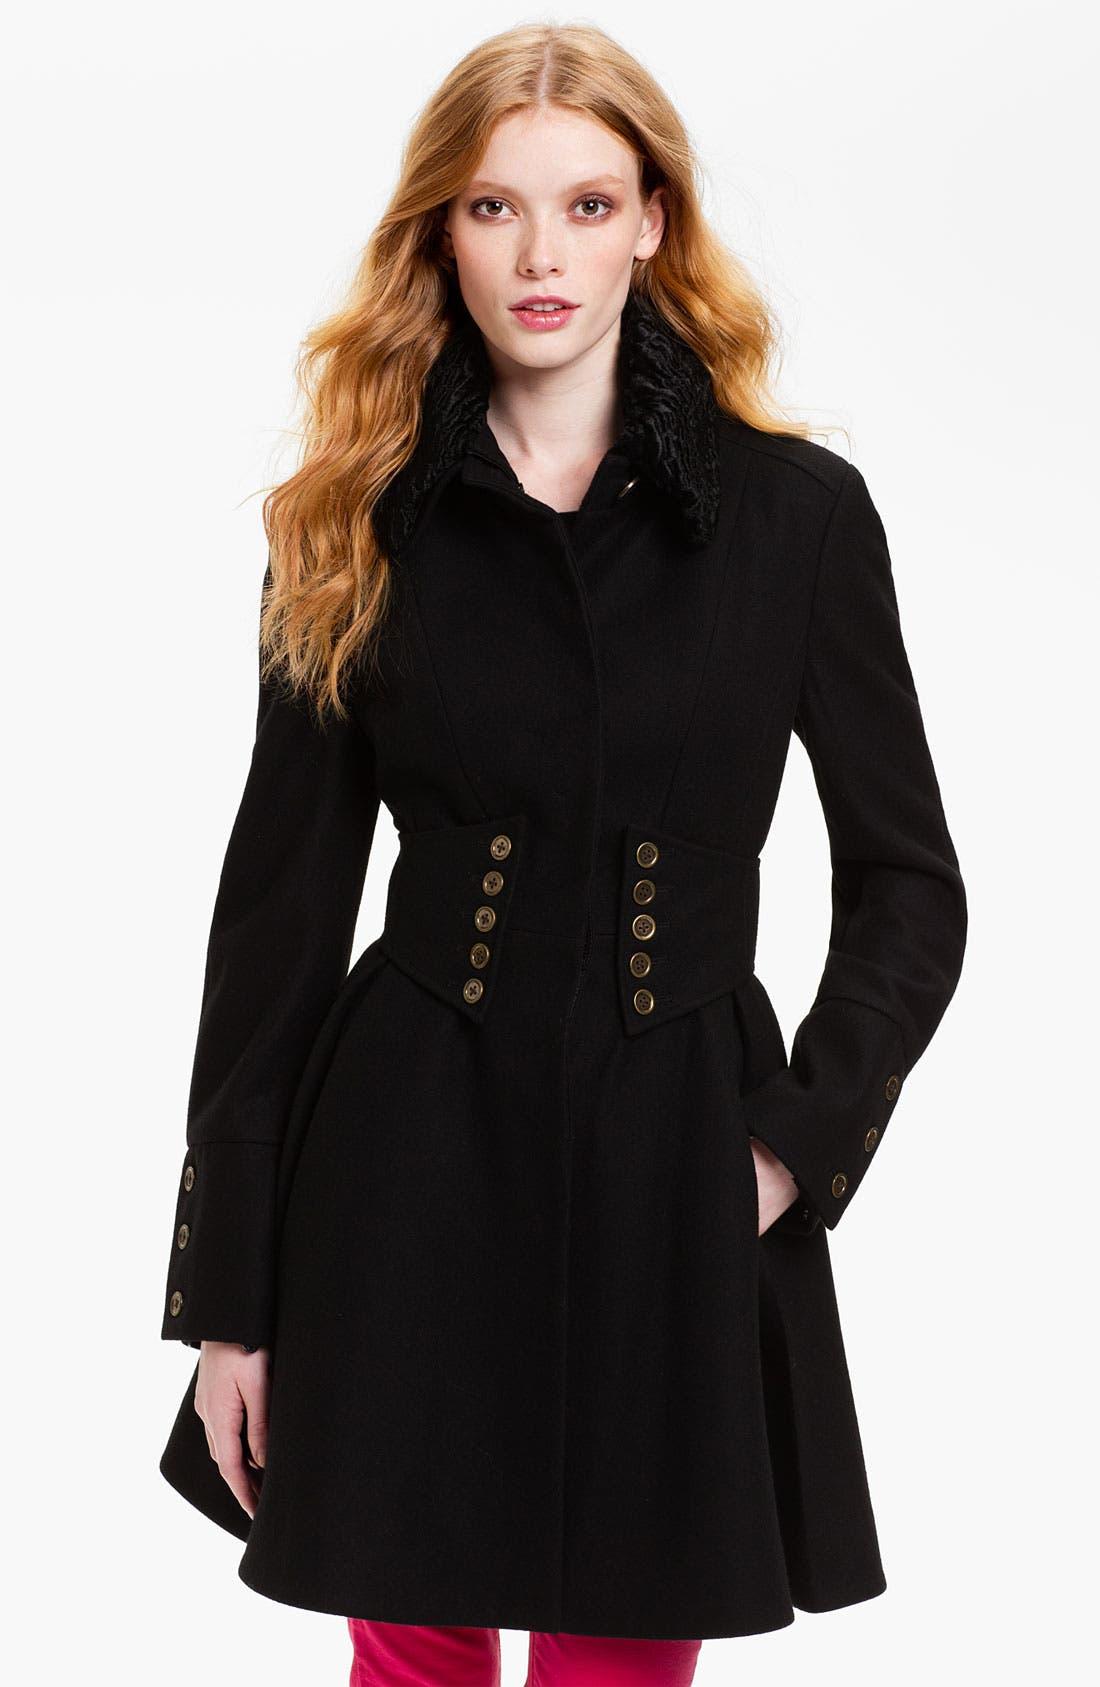 Alternate Image 1 Selected - Betsey Johnson Faux Fur Collar Coat